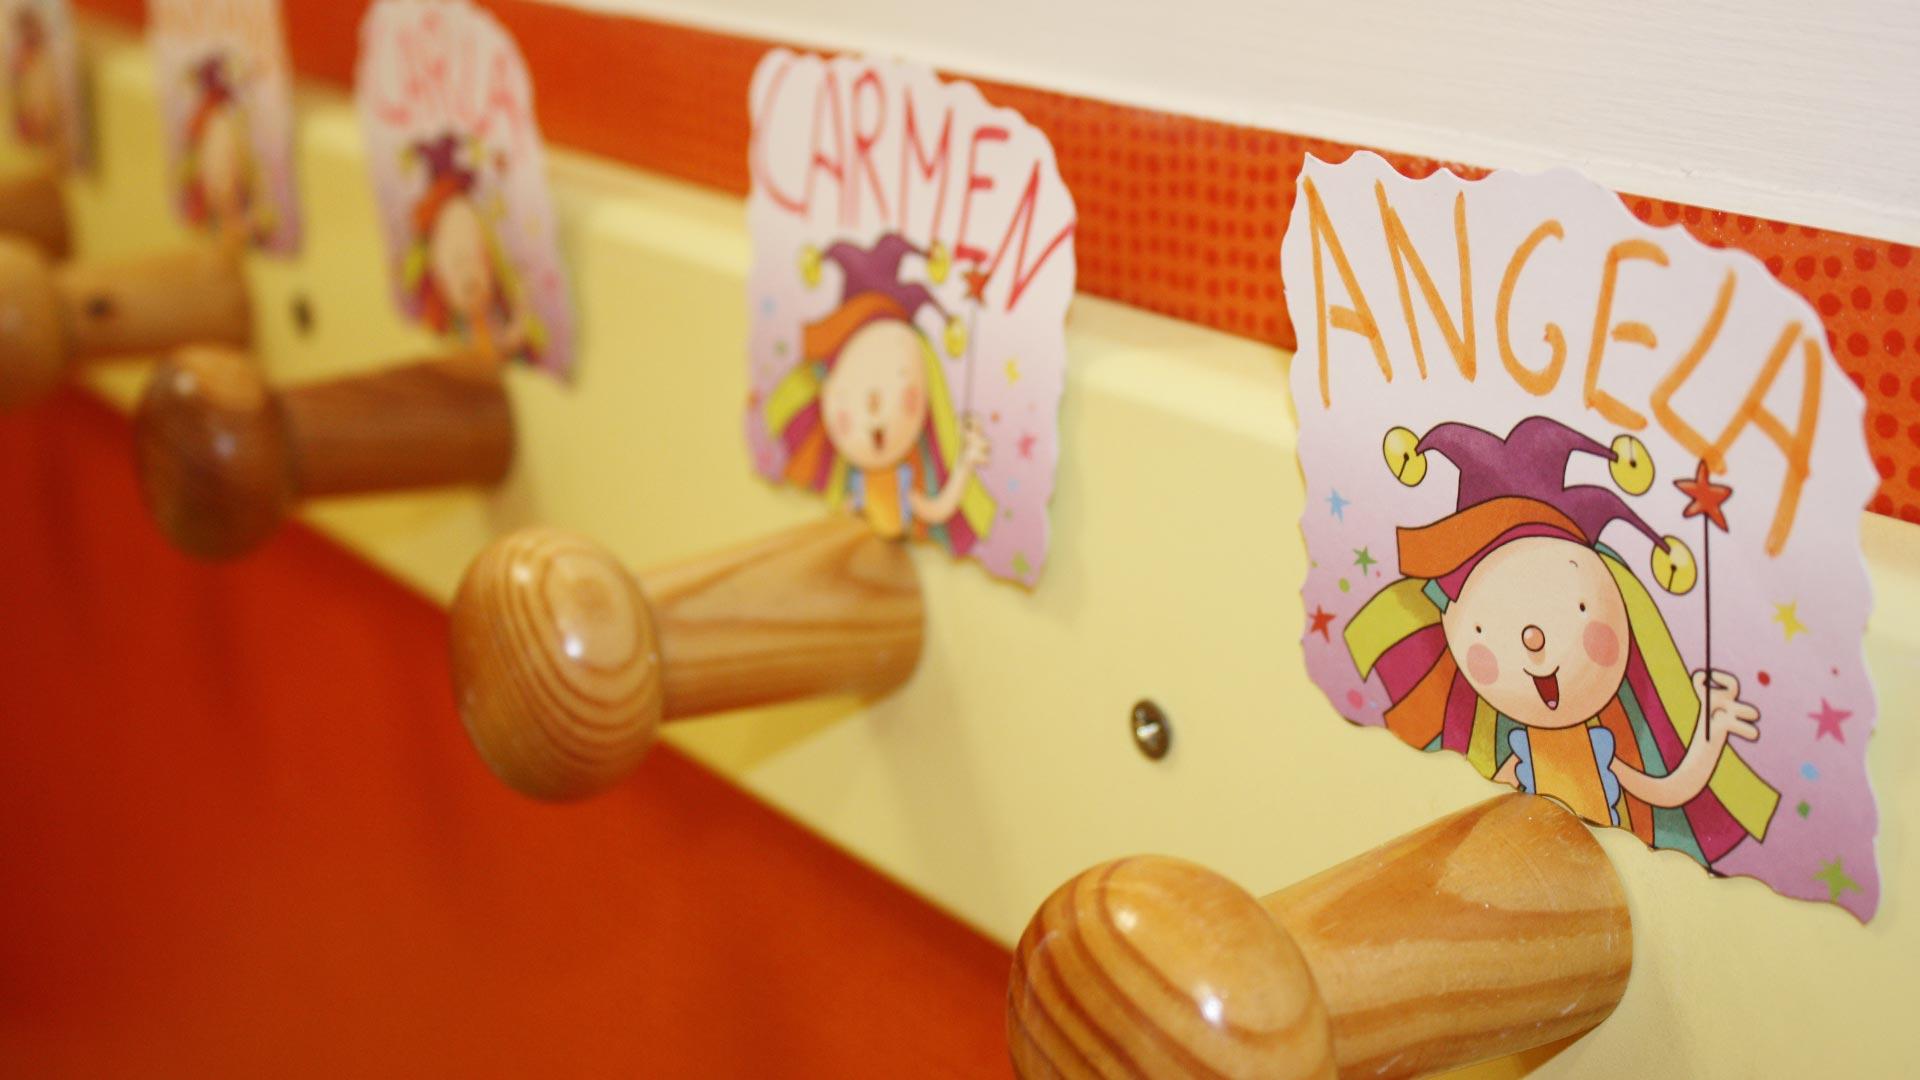 Perchas - Imagen de galería del Centro de Educación Infantil Gibralfaro